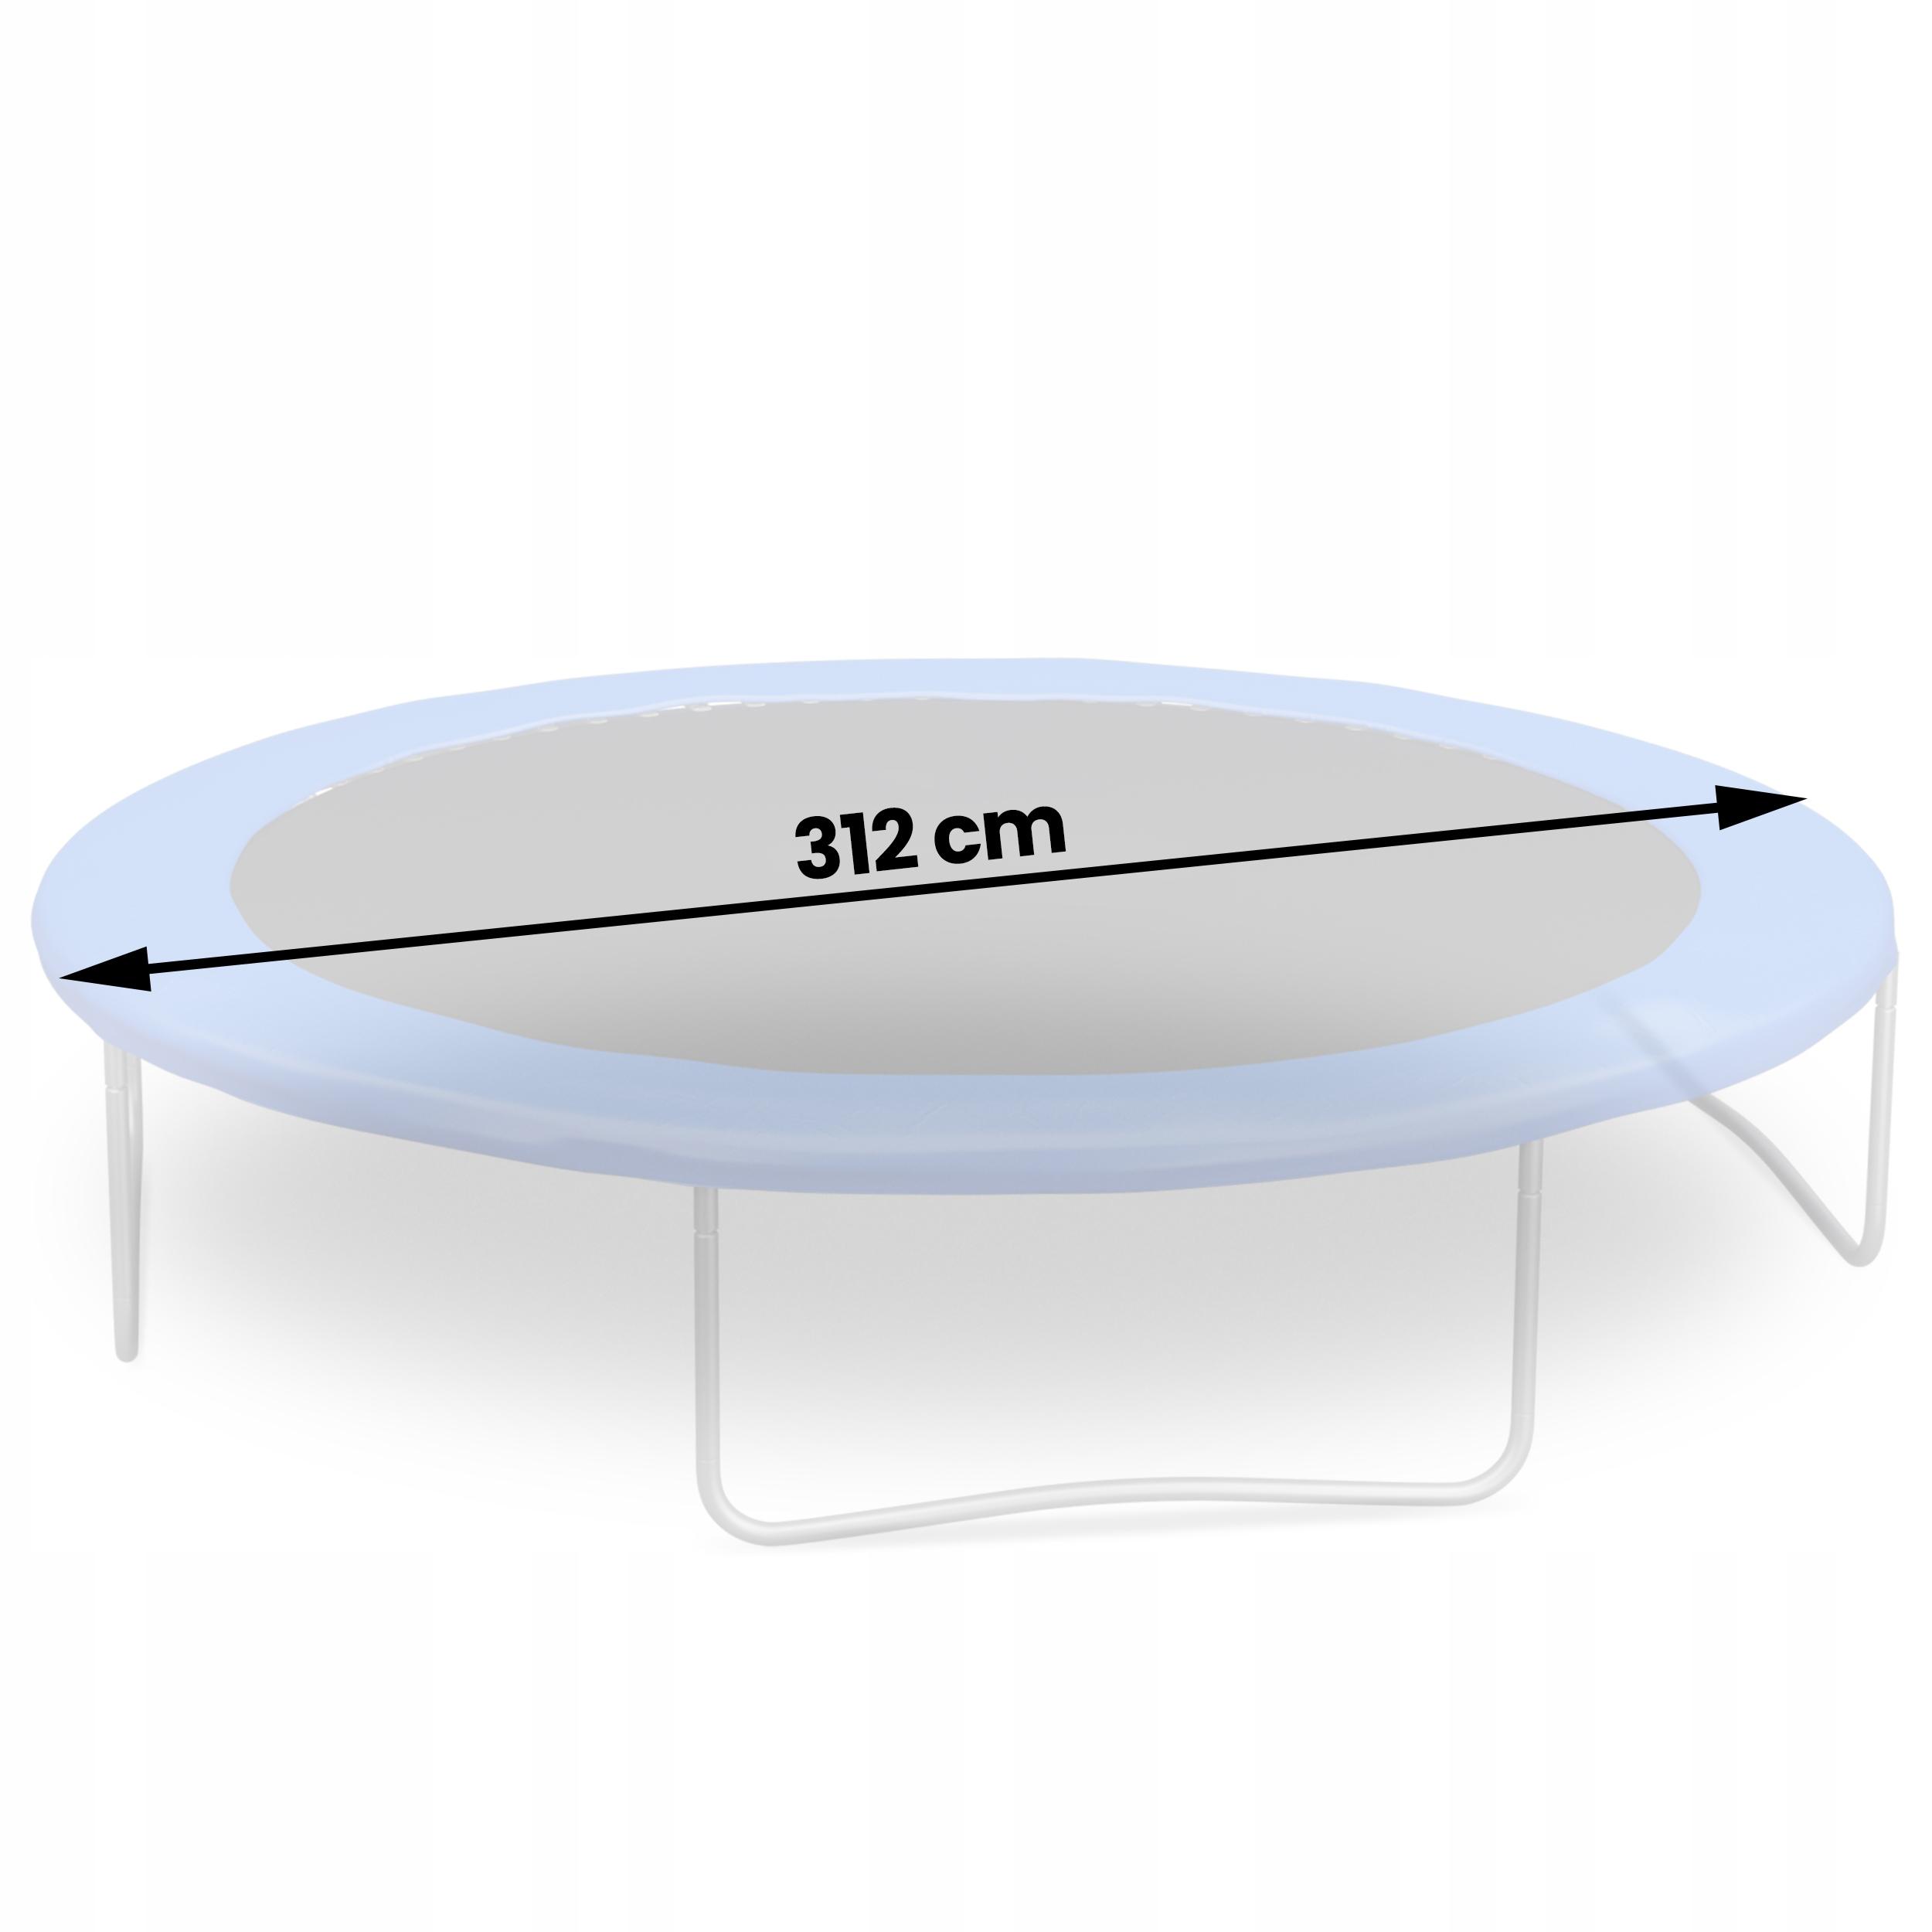 Mata do trampoliny batut 305 312cm 10ft 54 sprężyn Bohater brak